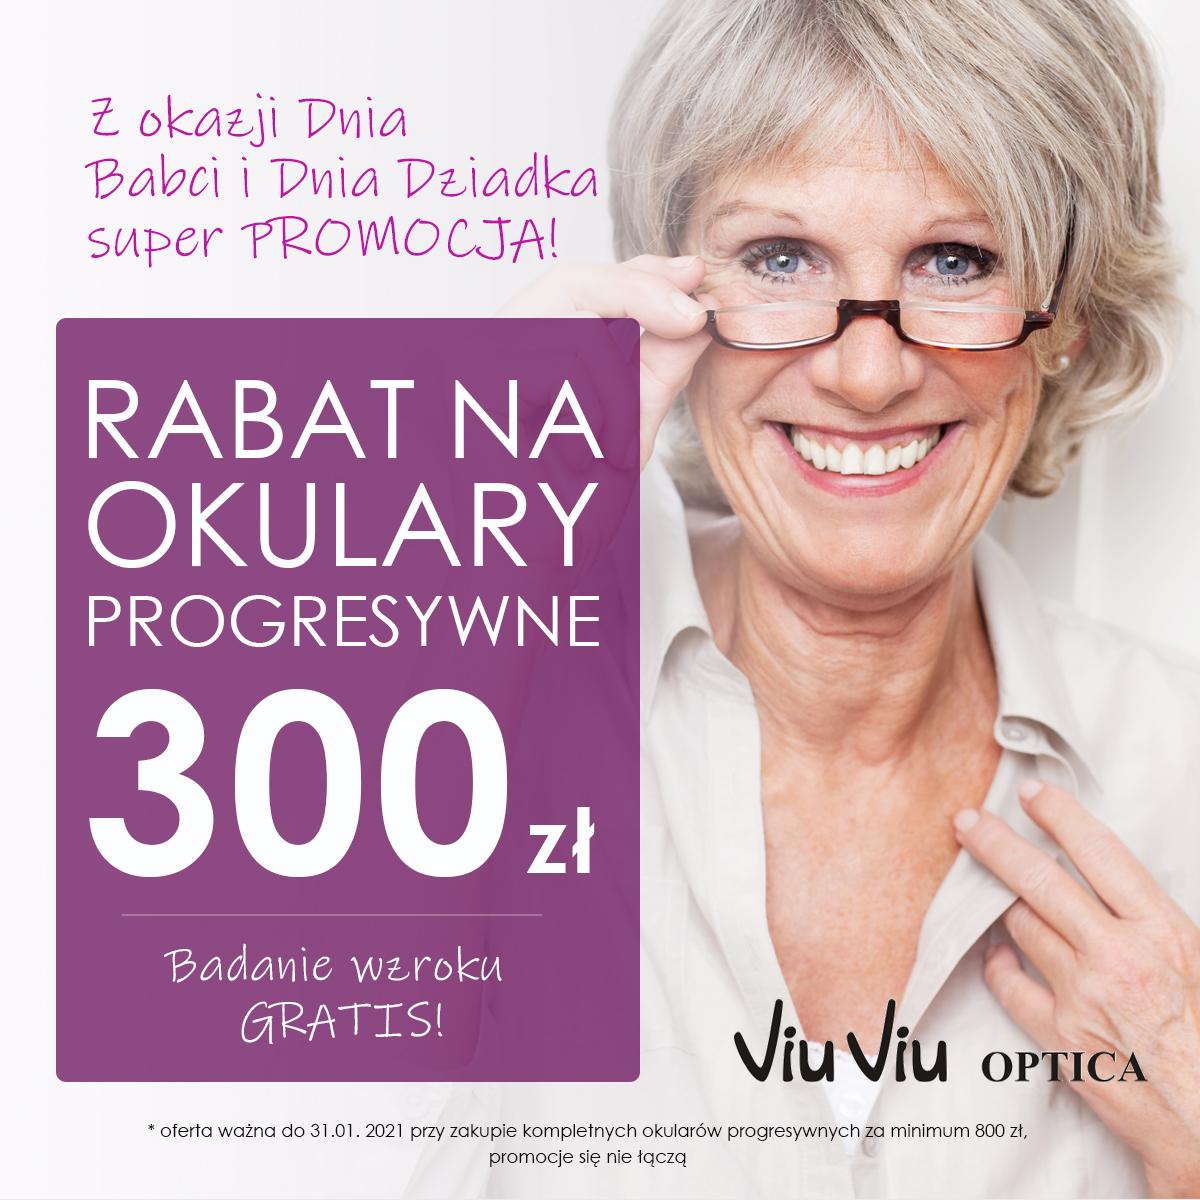 300 zł na okulary progresywne